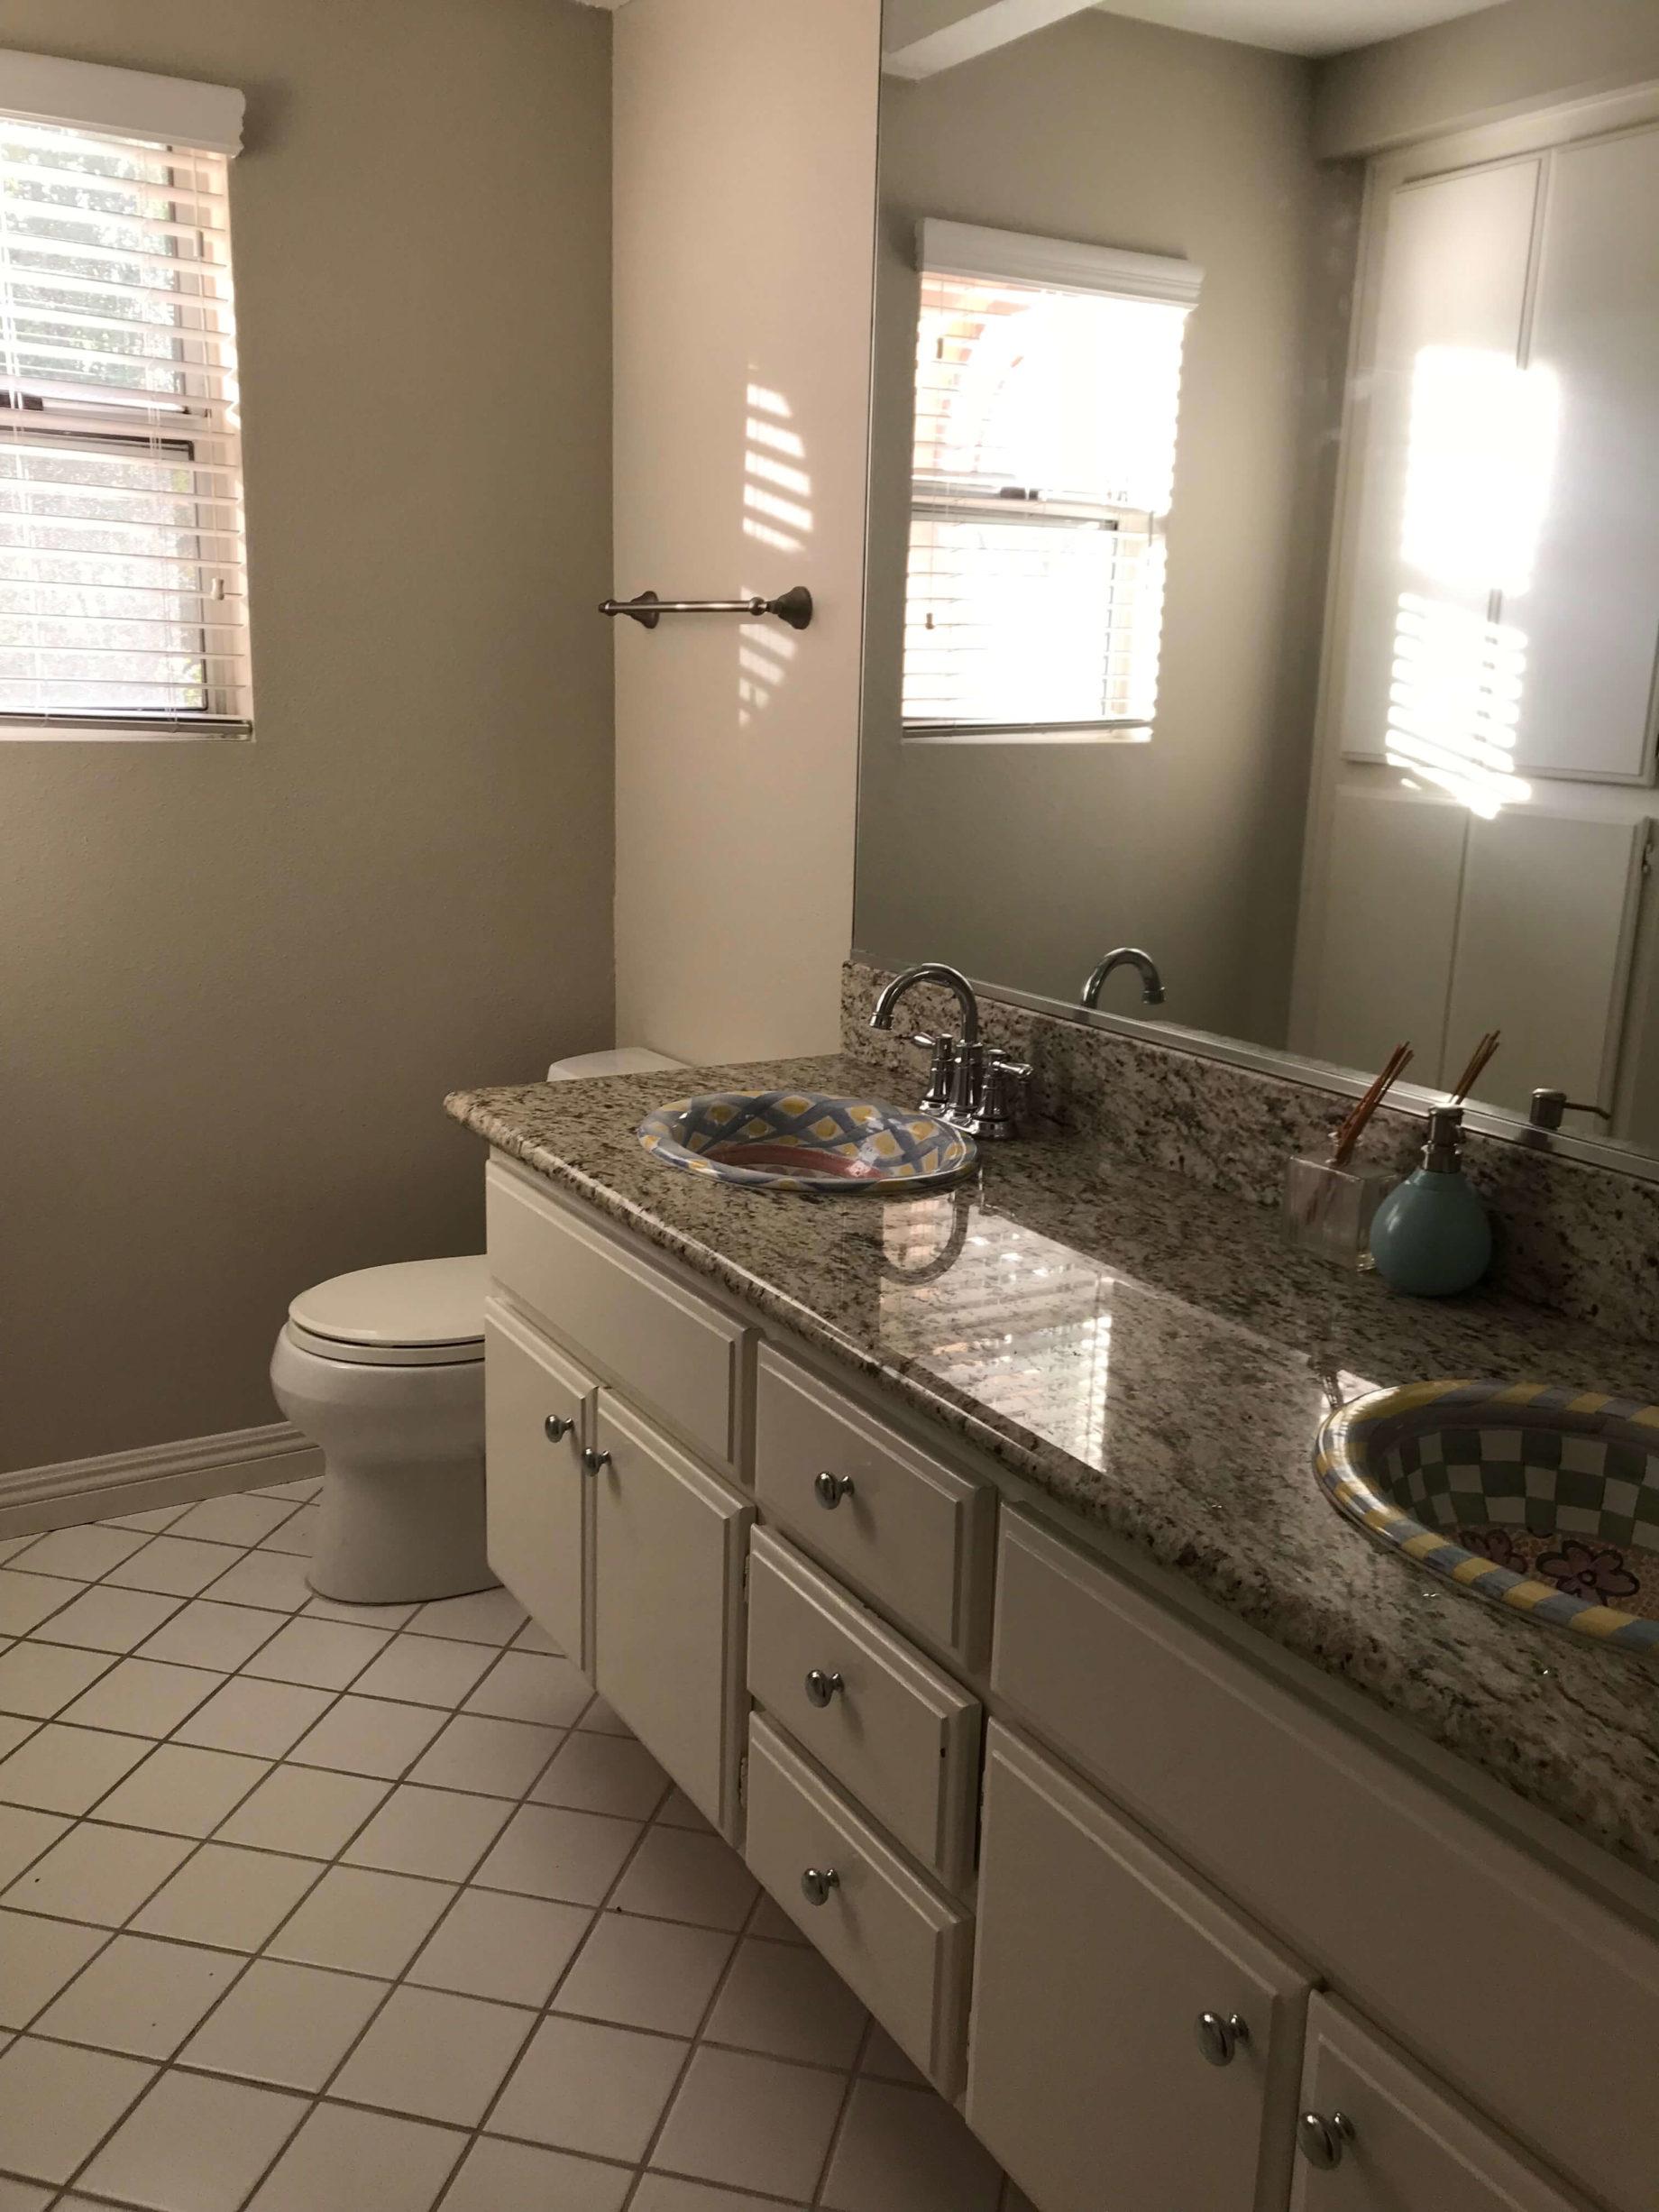 Kids' bathroom renovation before photos! - M Loves M @marmar